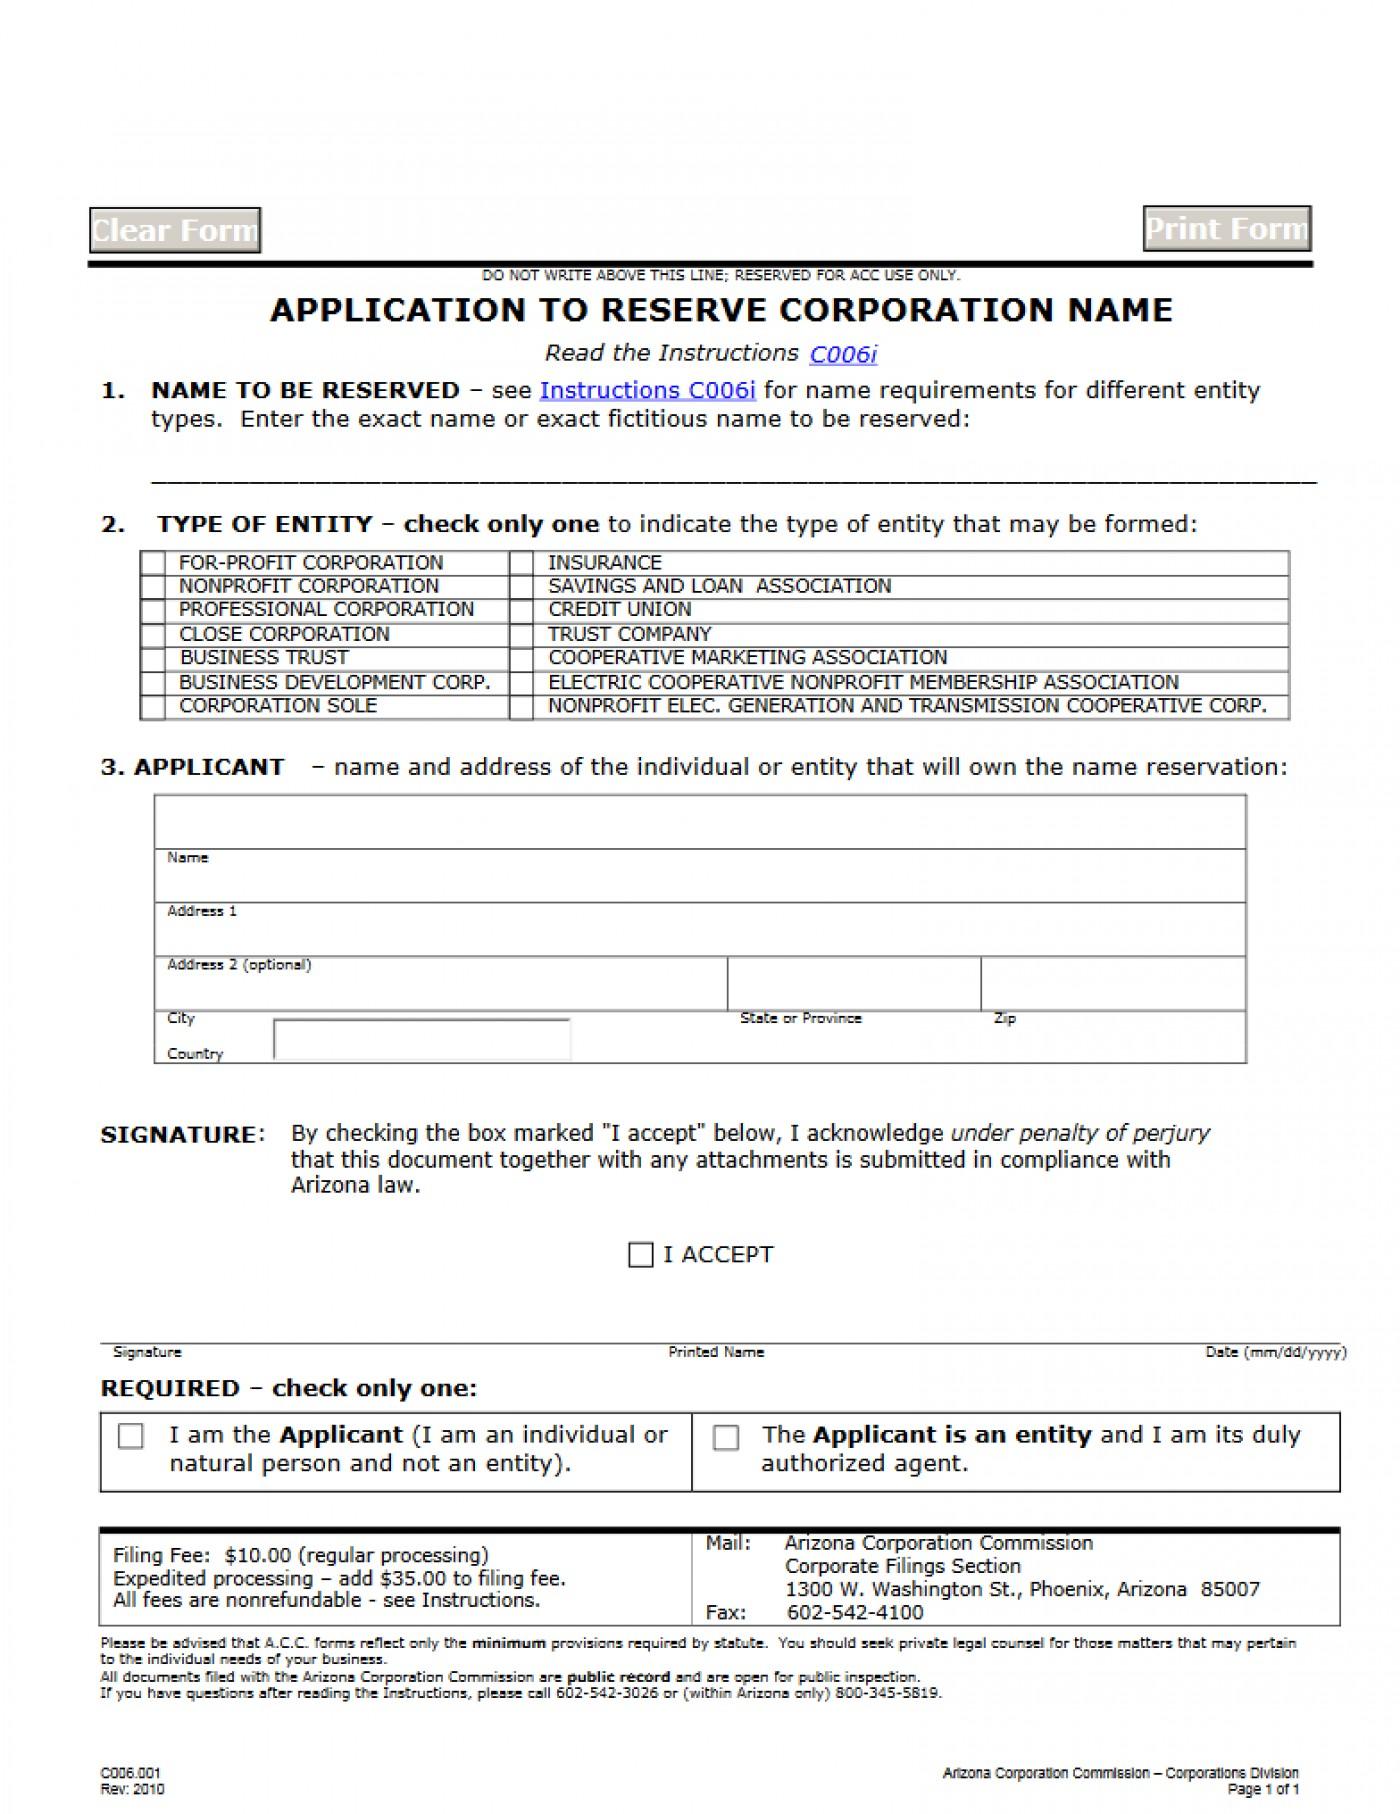 Dba Application Form Arizona